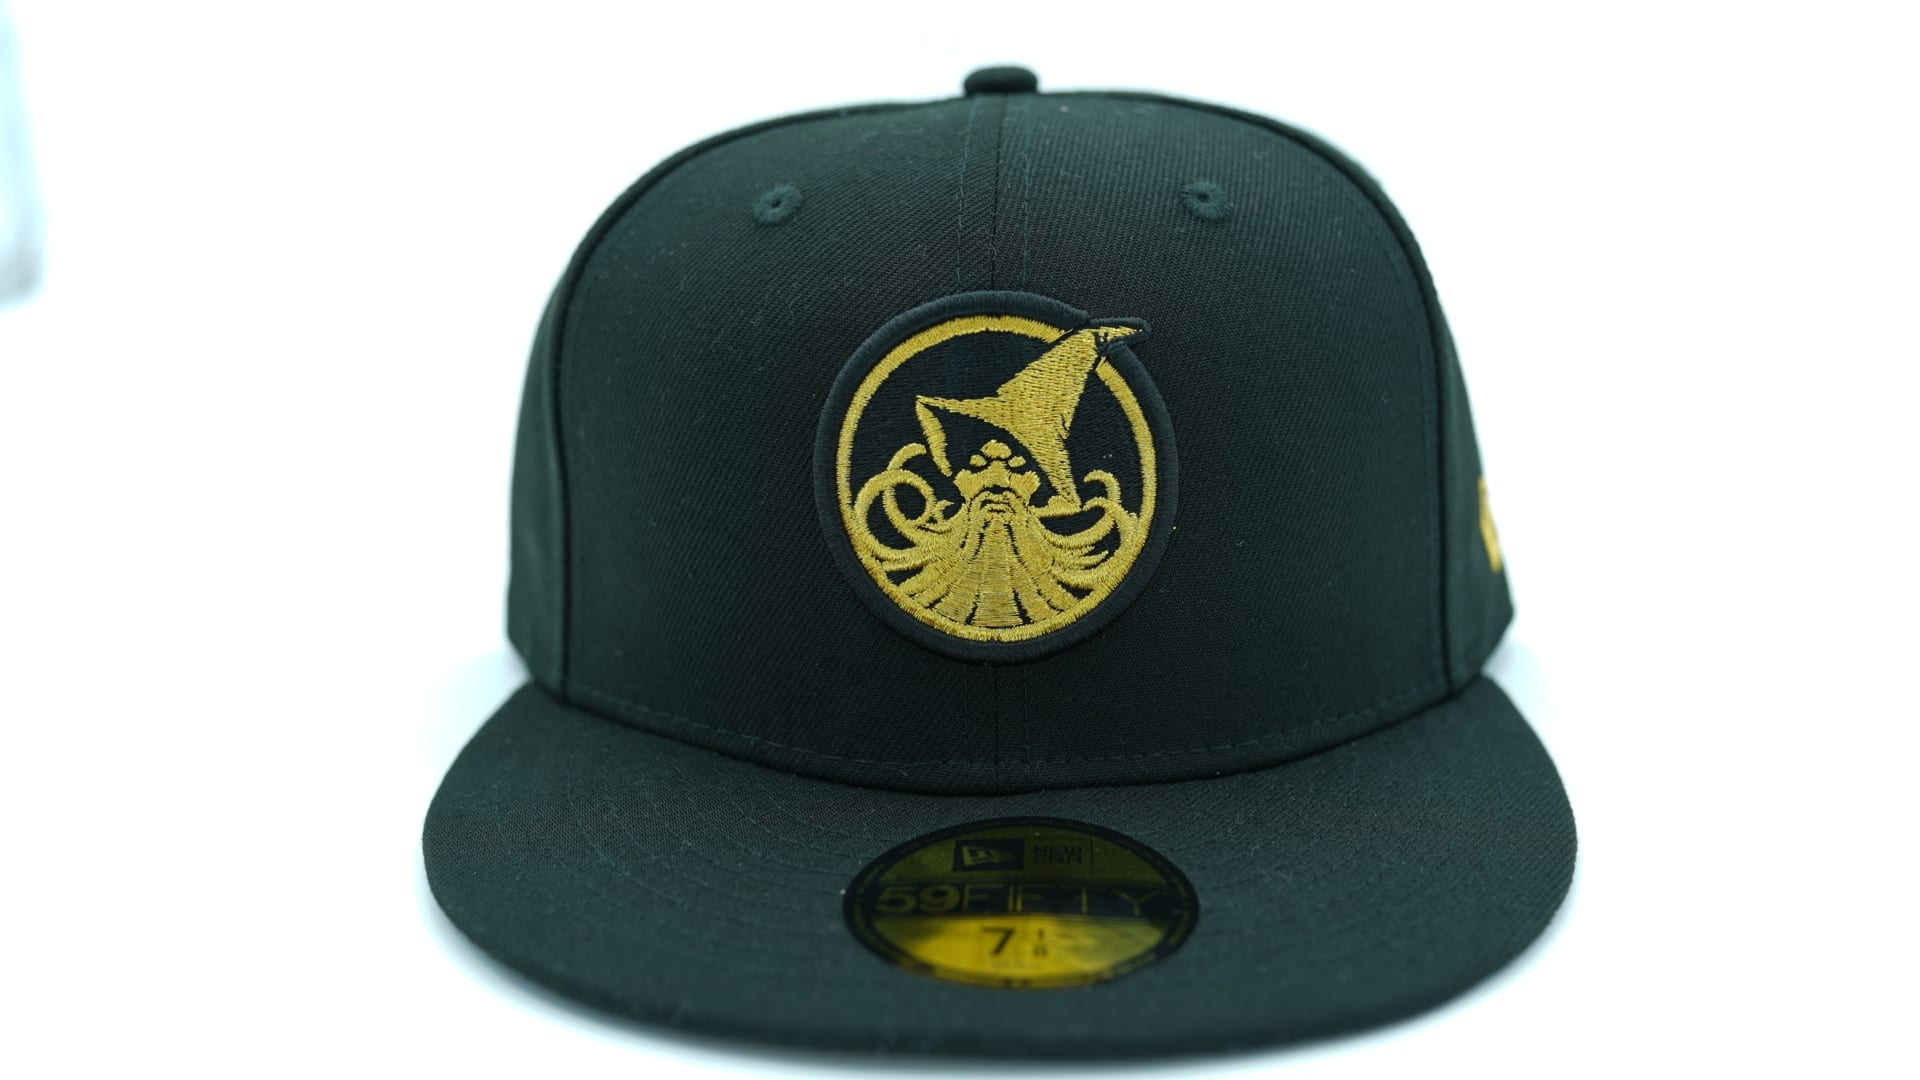 minnesota timberwolves current logo 59fifty fitted baseball cap new era nba